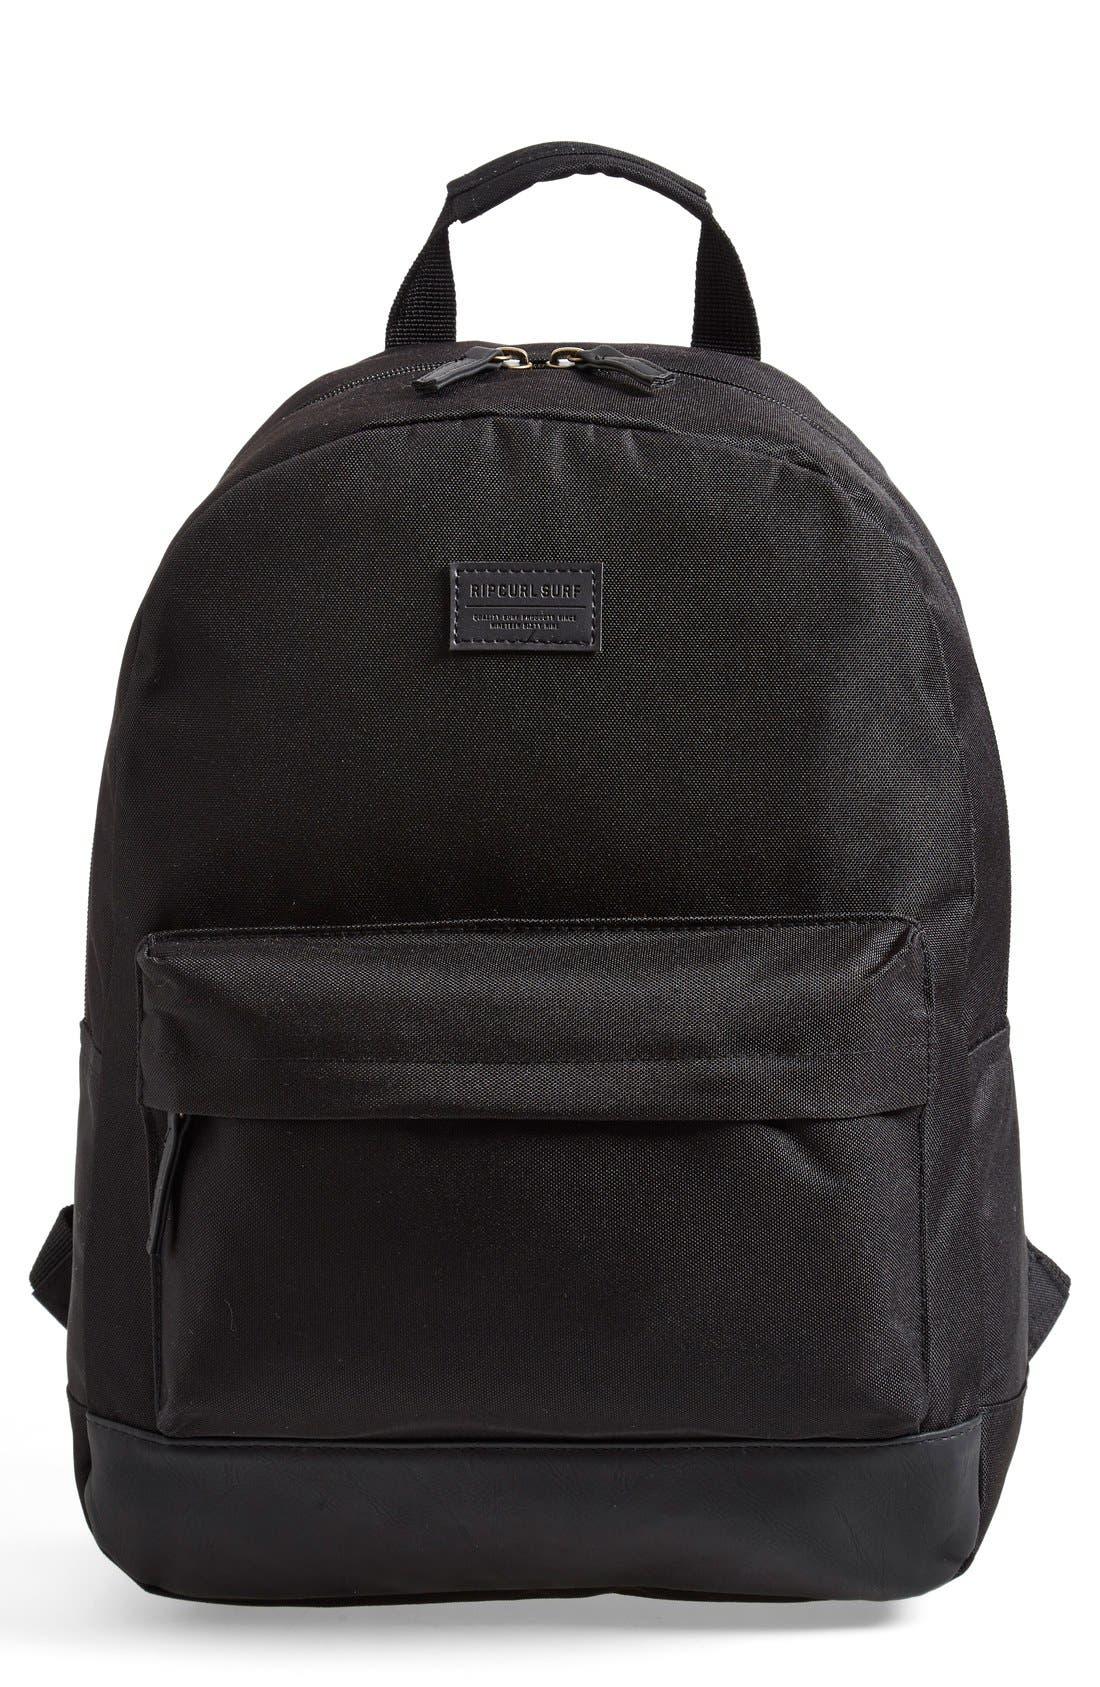 Main Image - Rip Curl 'Campus' Backpack